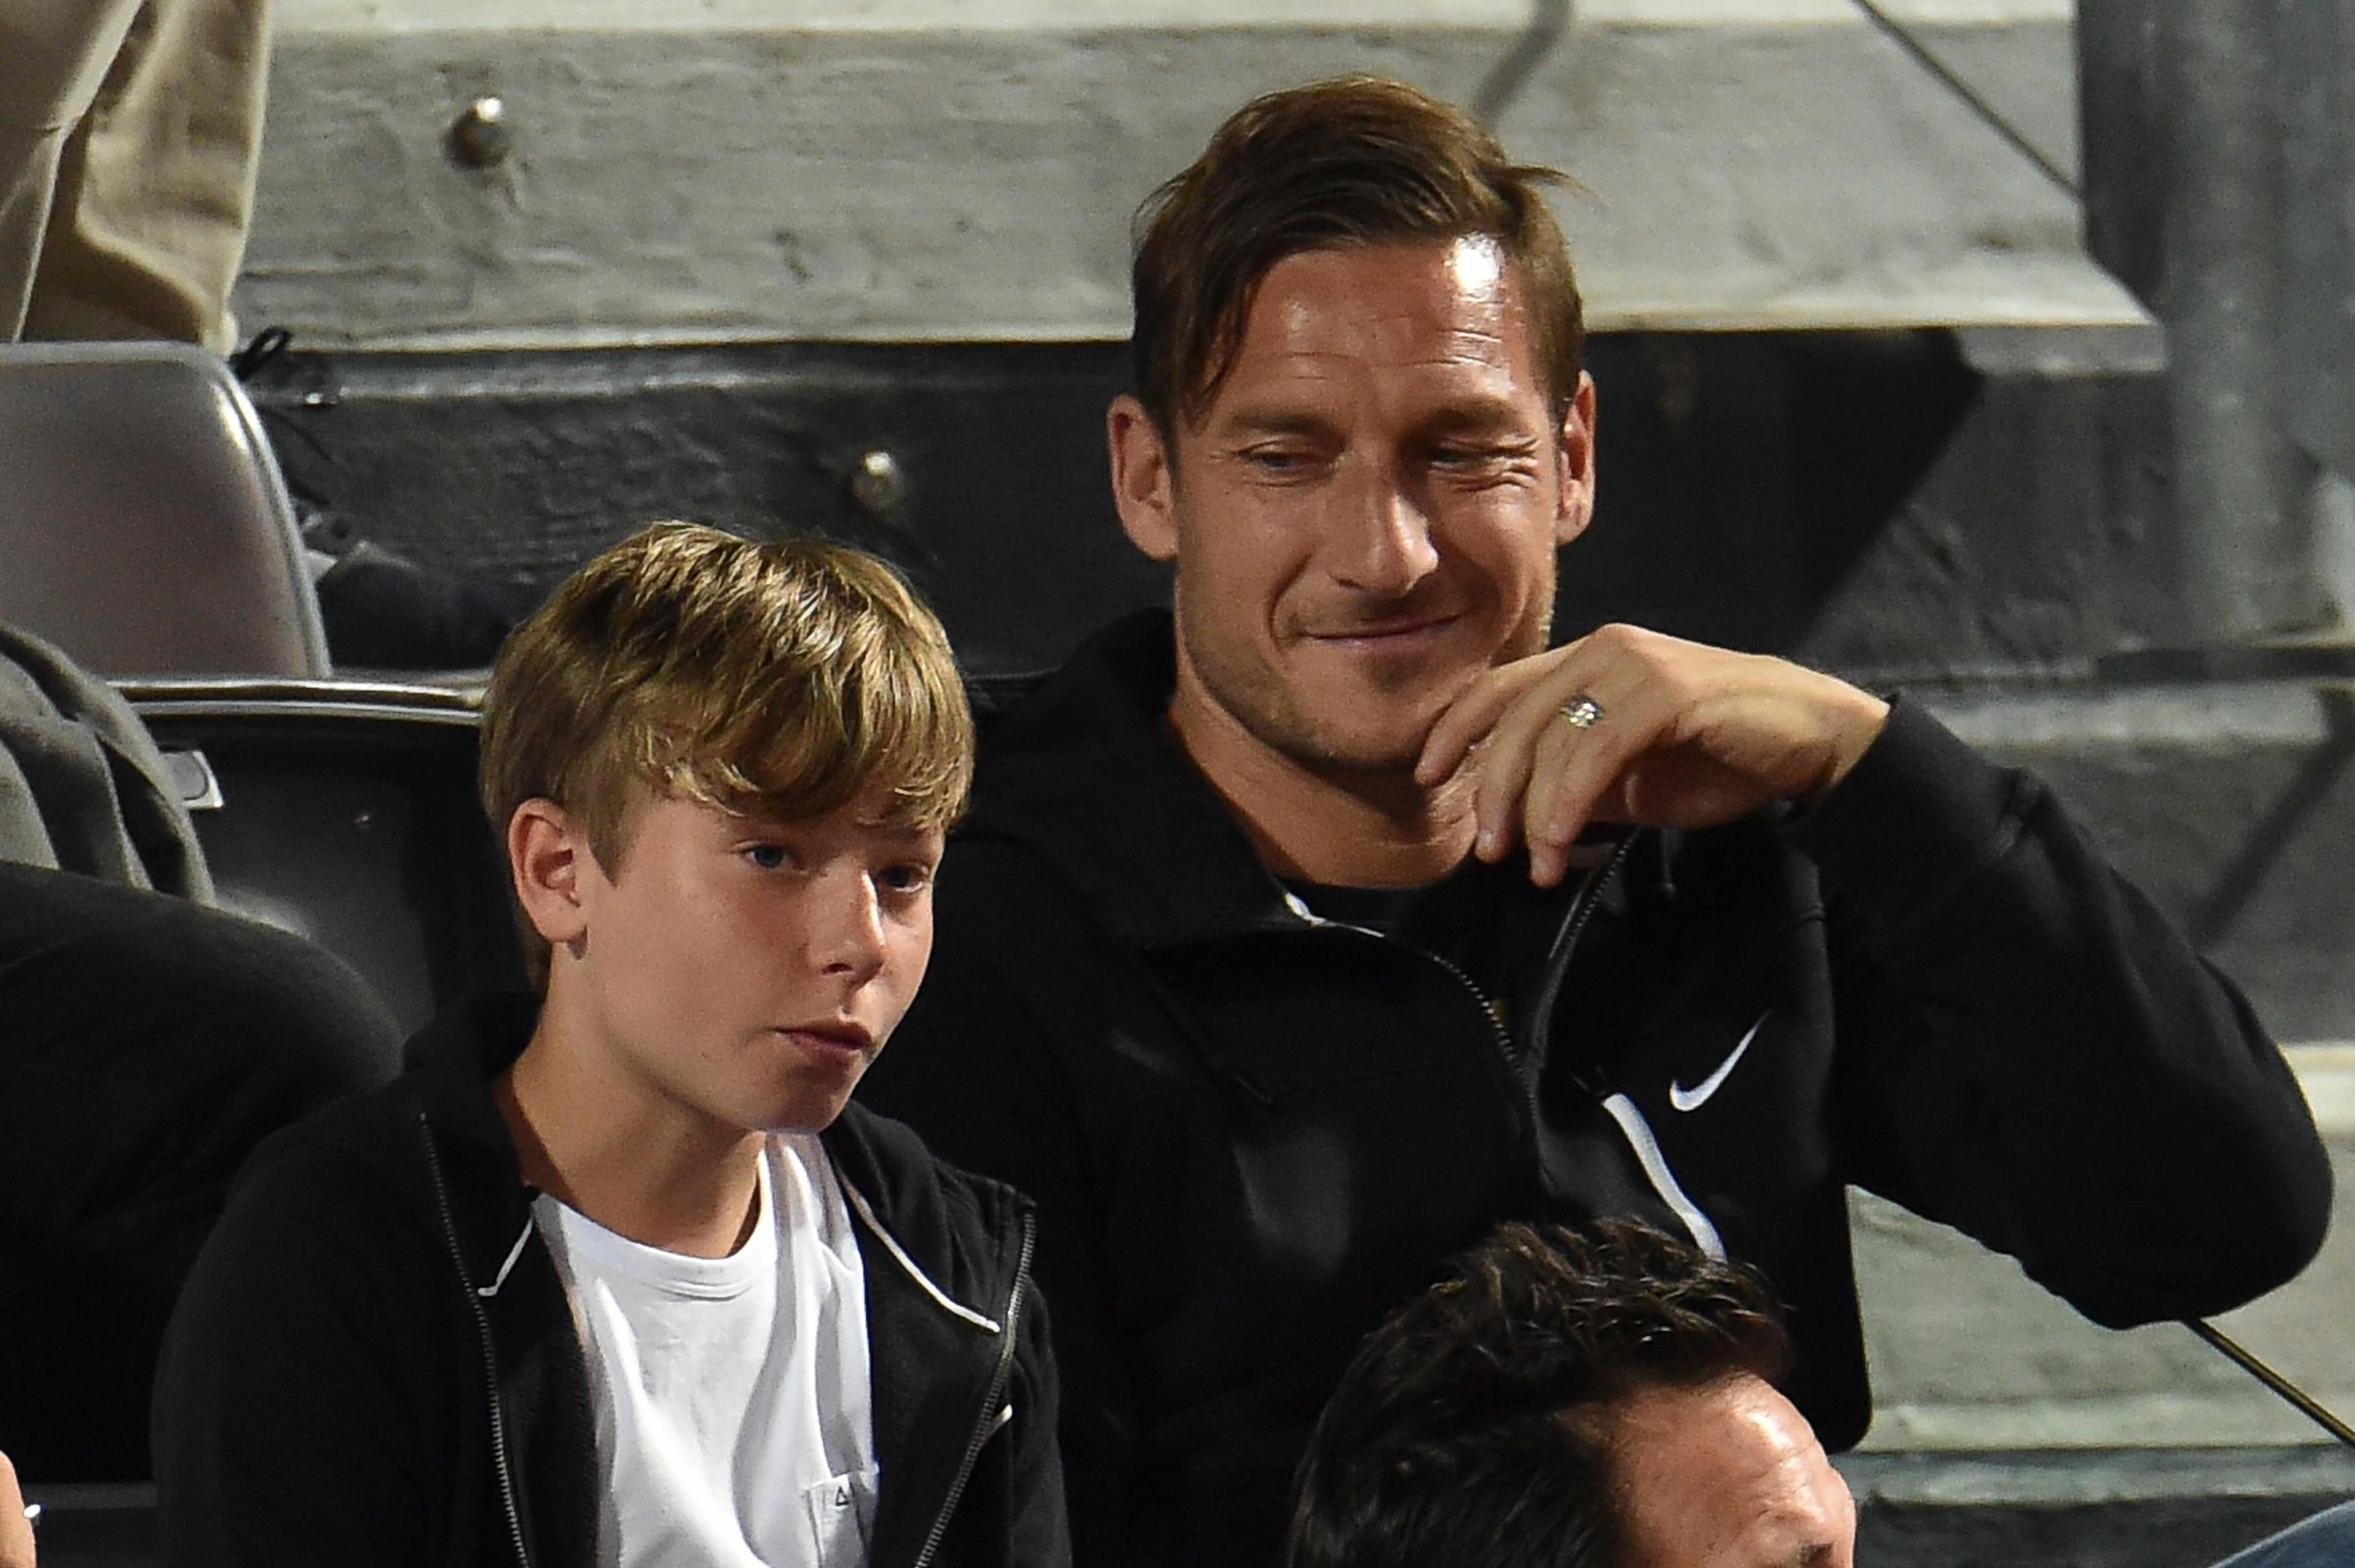 Cristian Totti, Francesco's Son